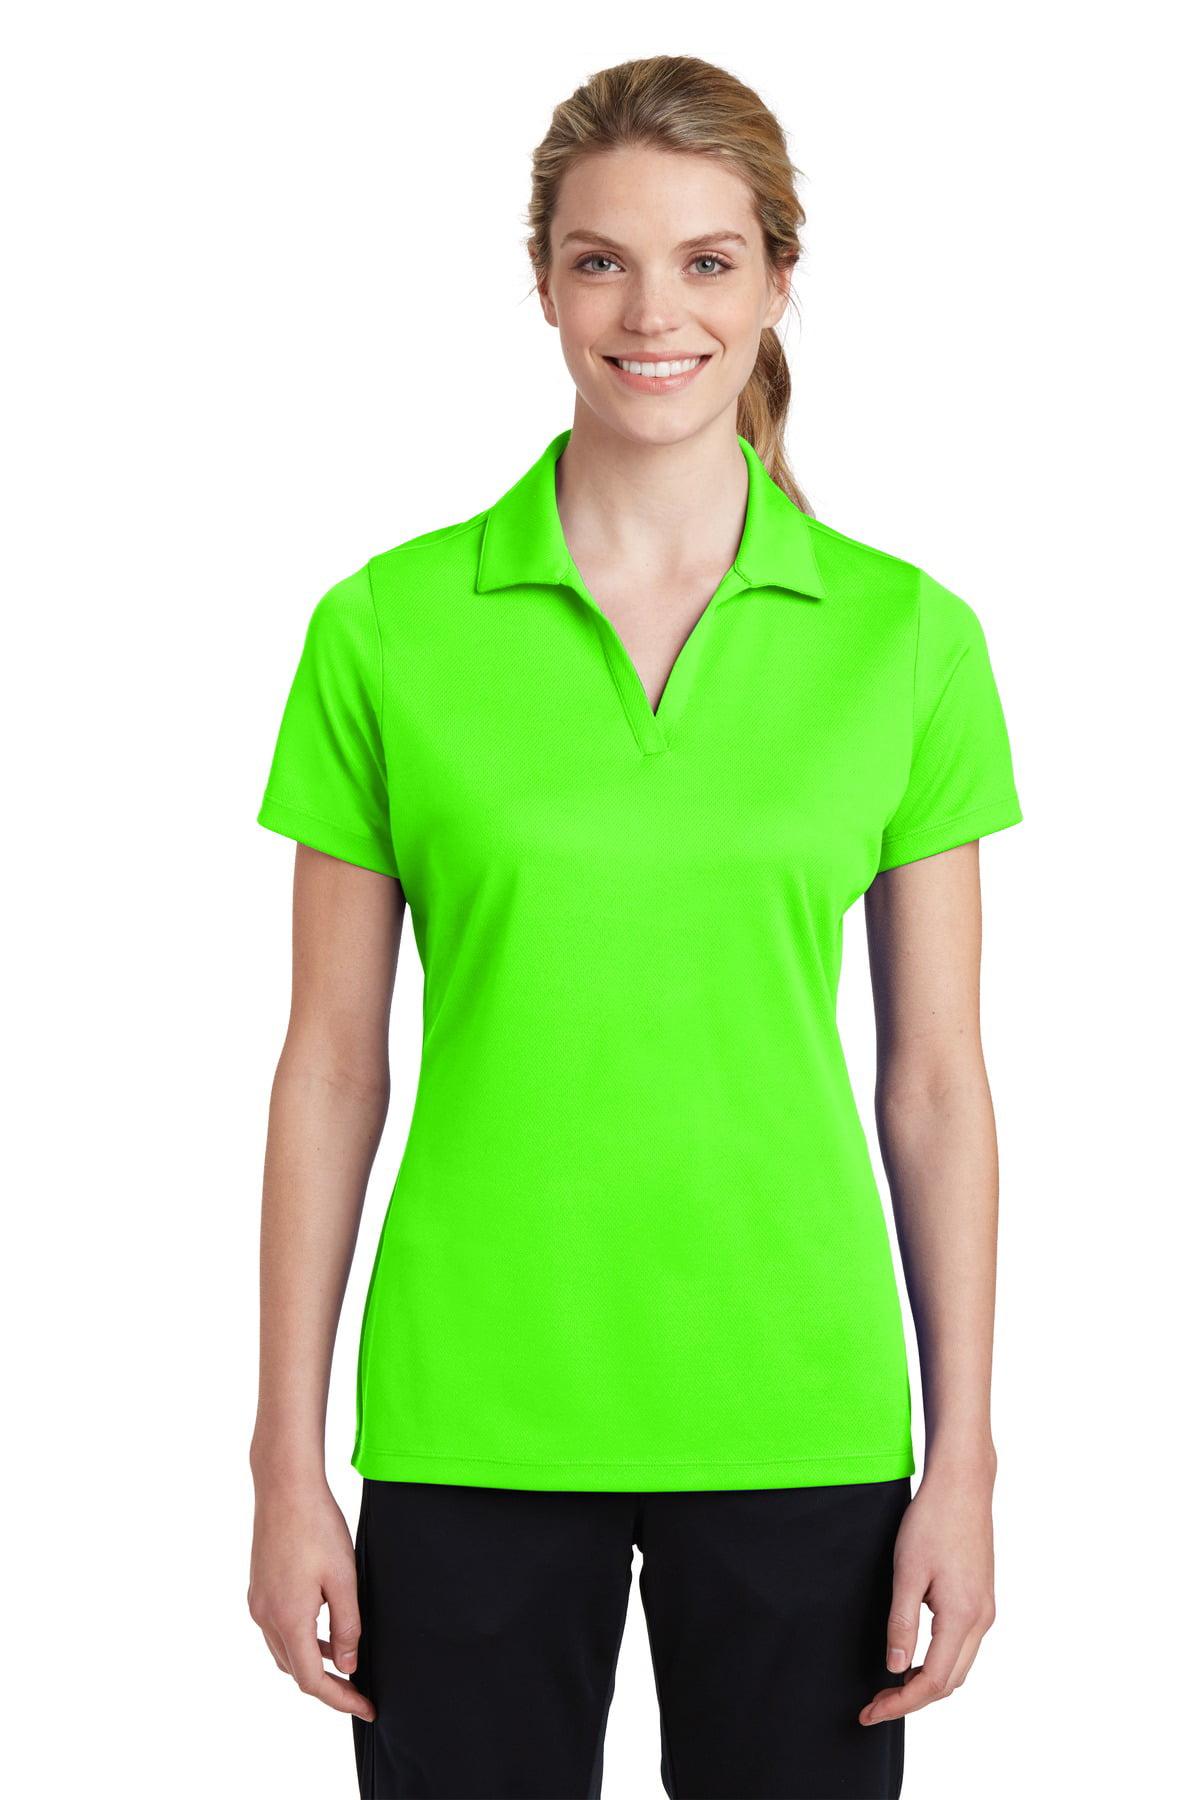 Neon Green T Shirts Womens Bcd Tofu House